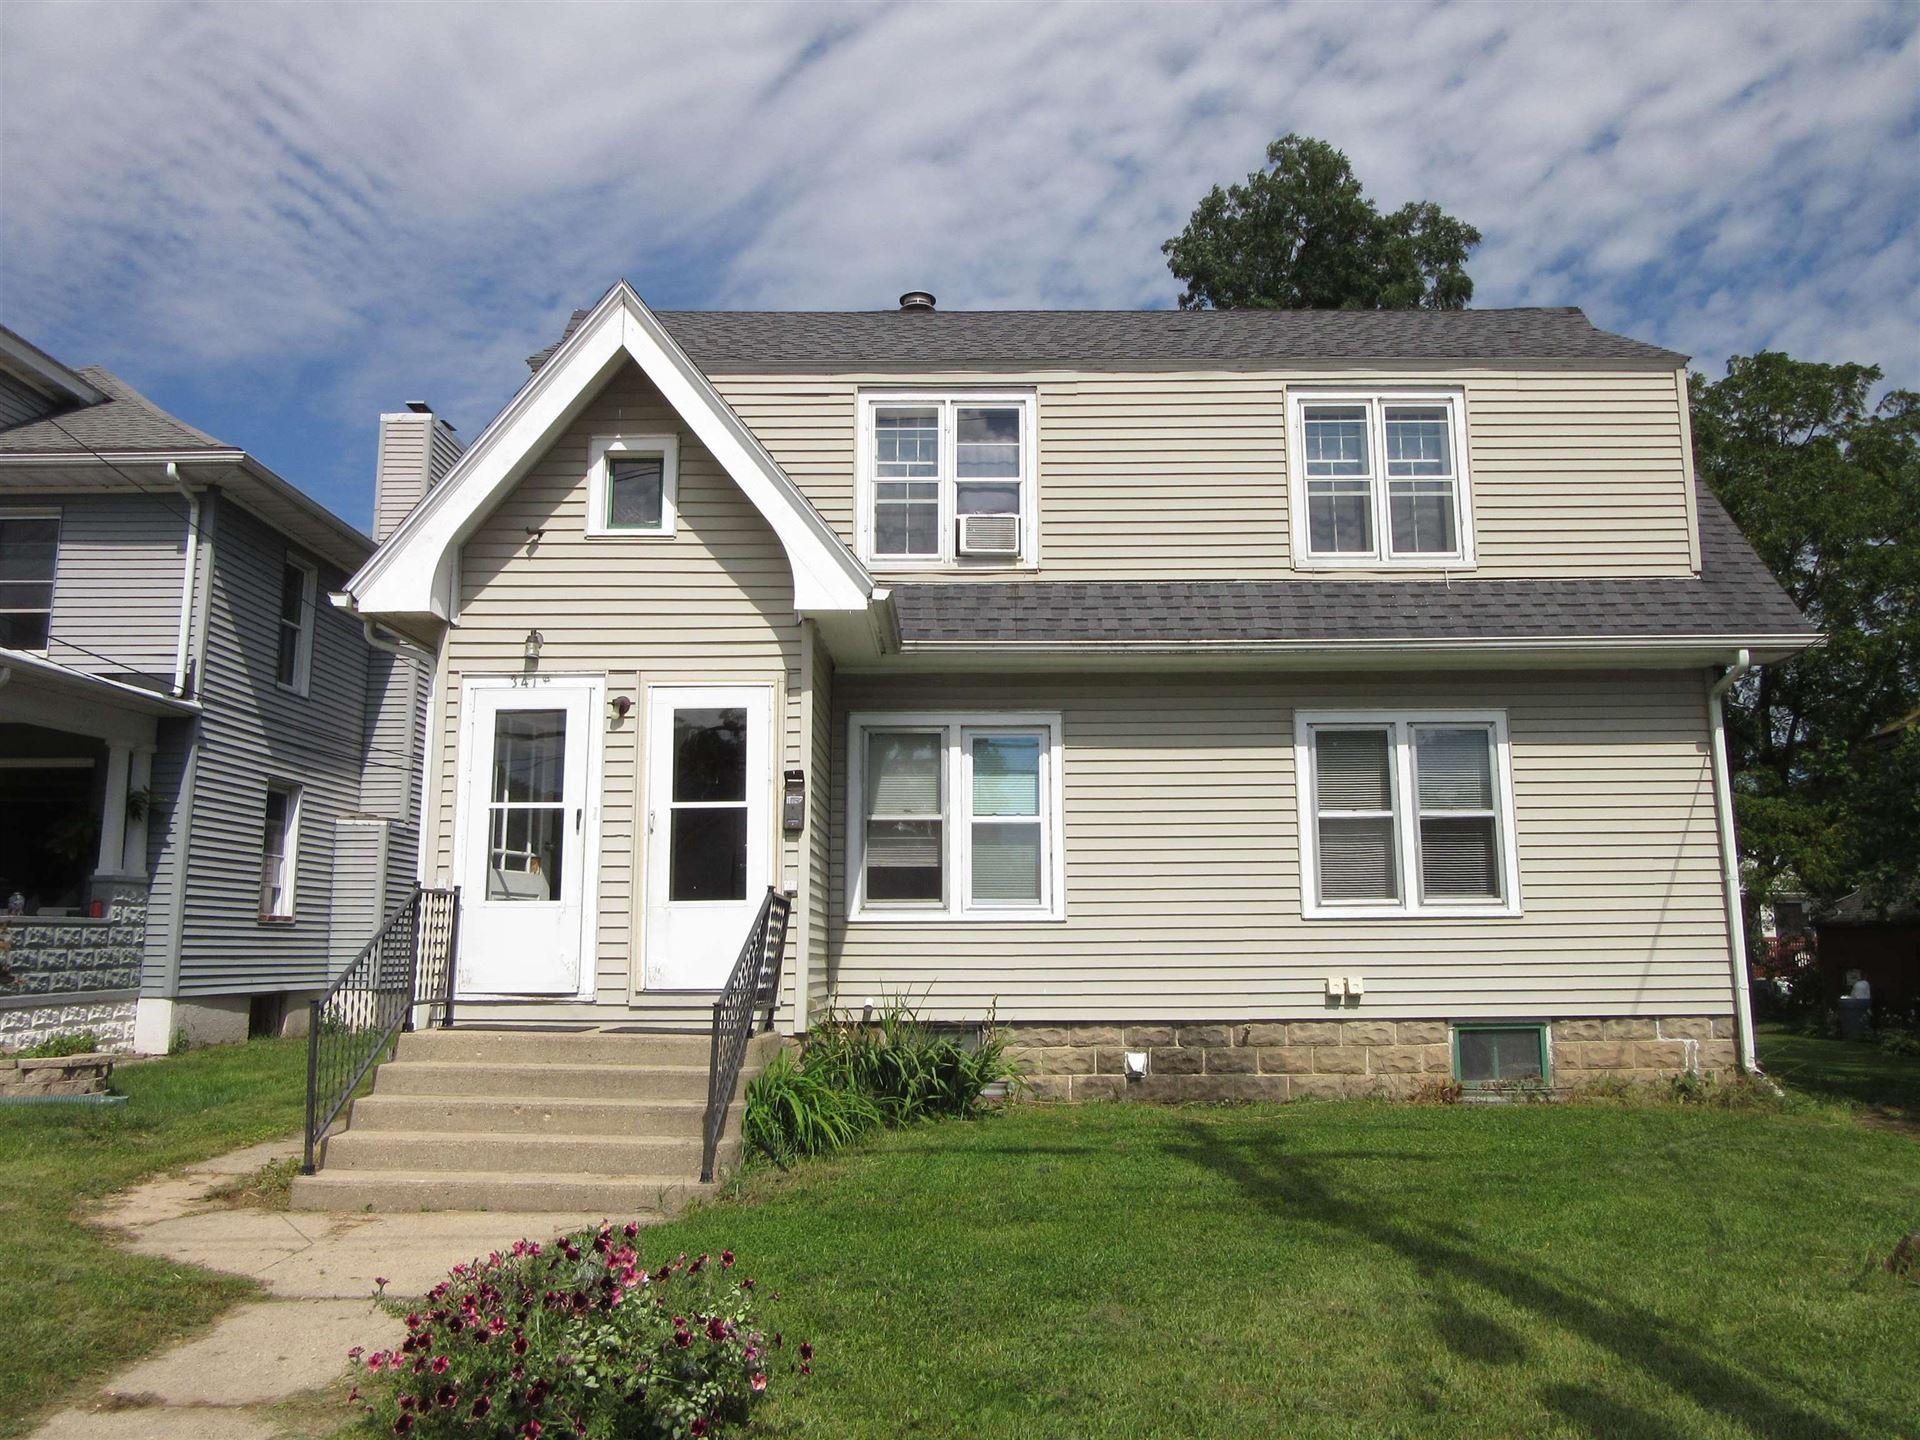 341 Maine St, Mauston, WI 53948 - #: 1919439